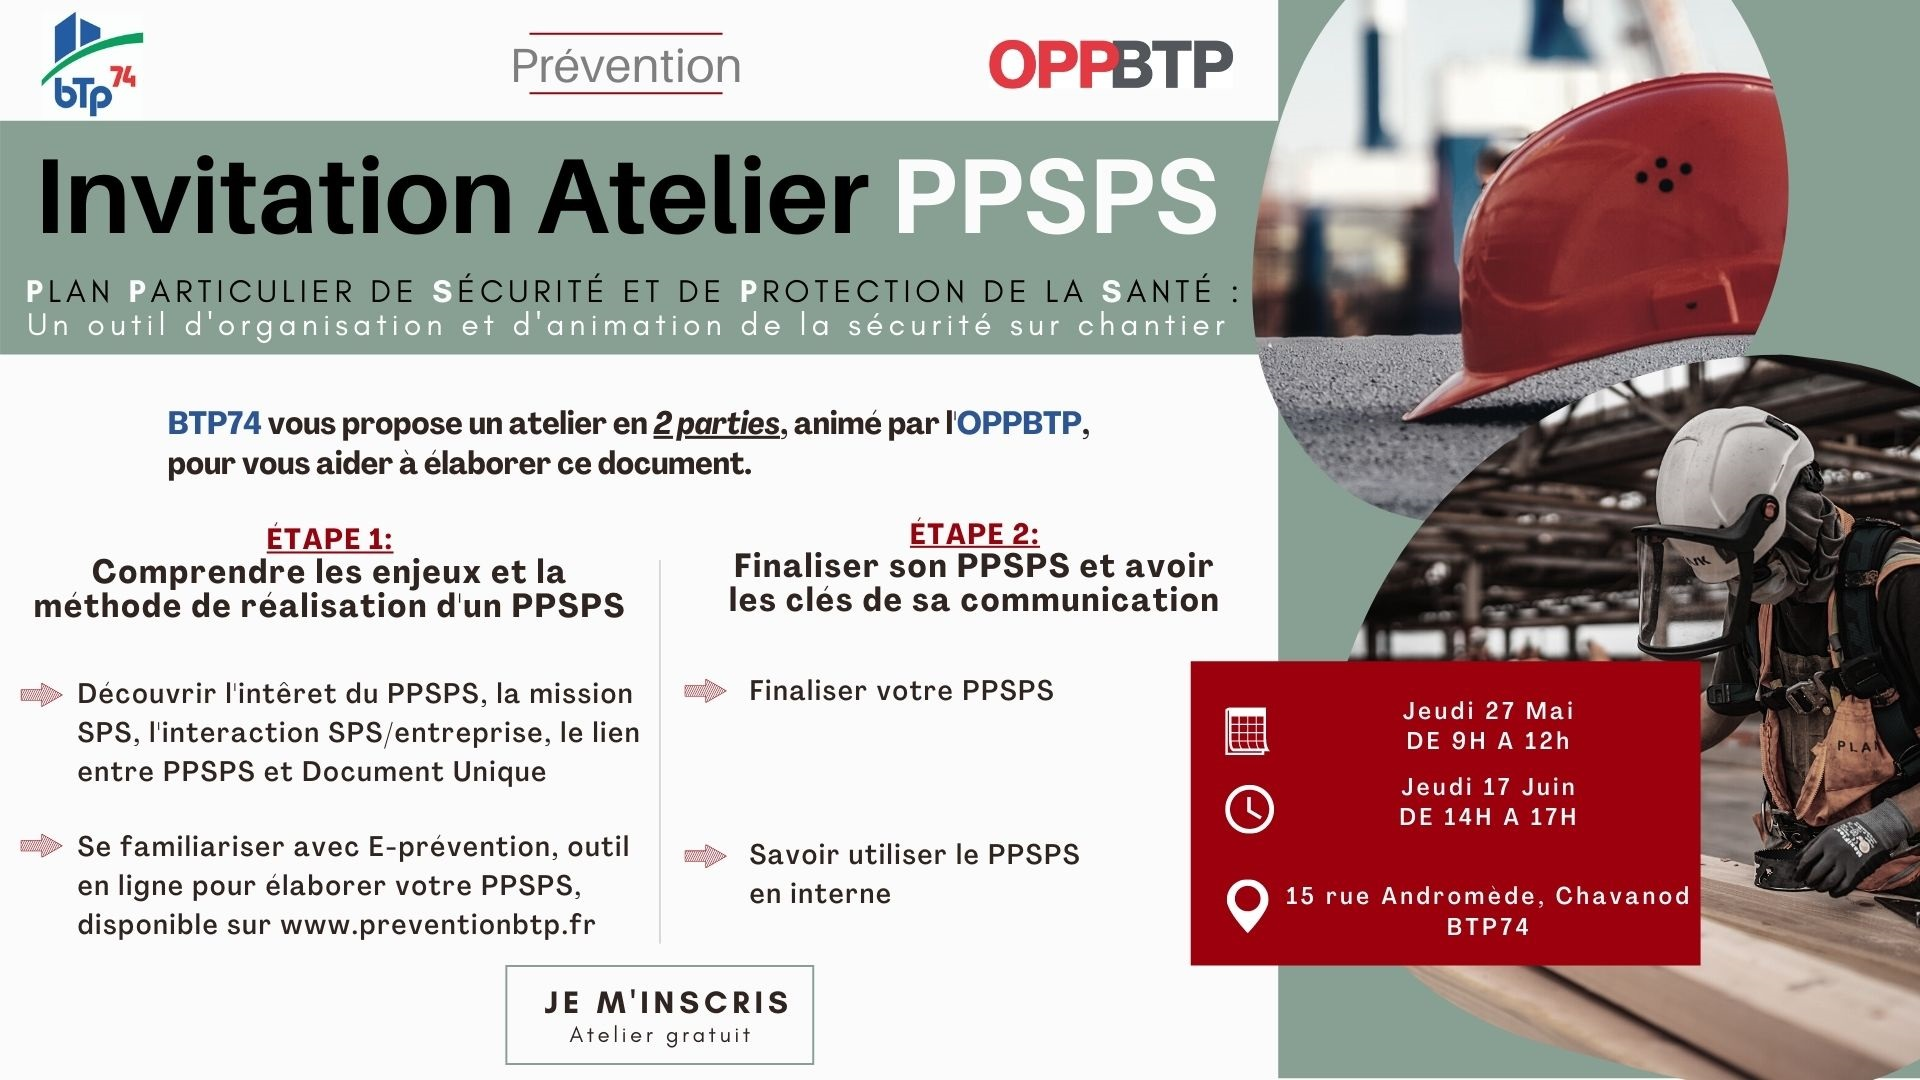 Ateliers, Fédération BTP74 & OPPBTP